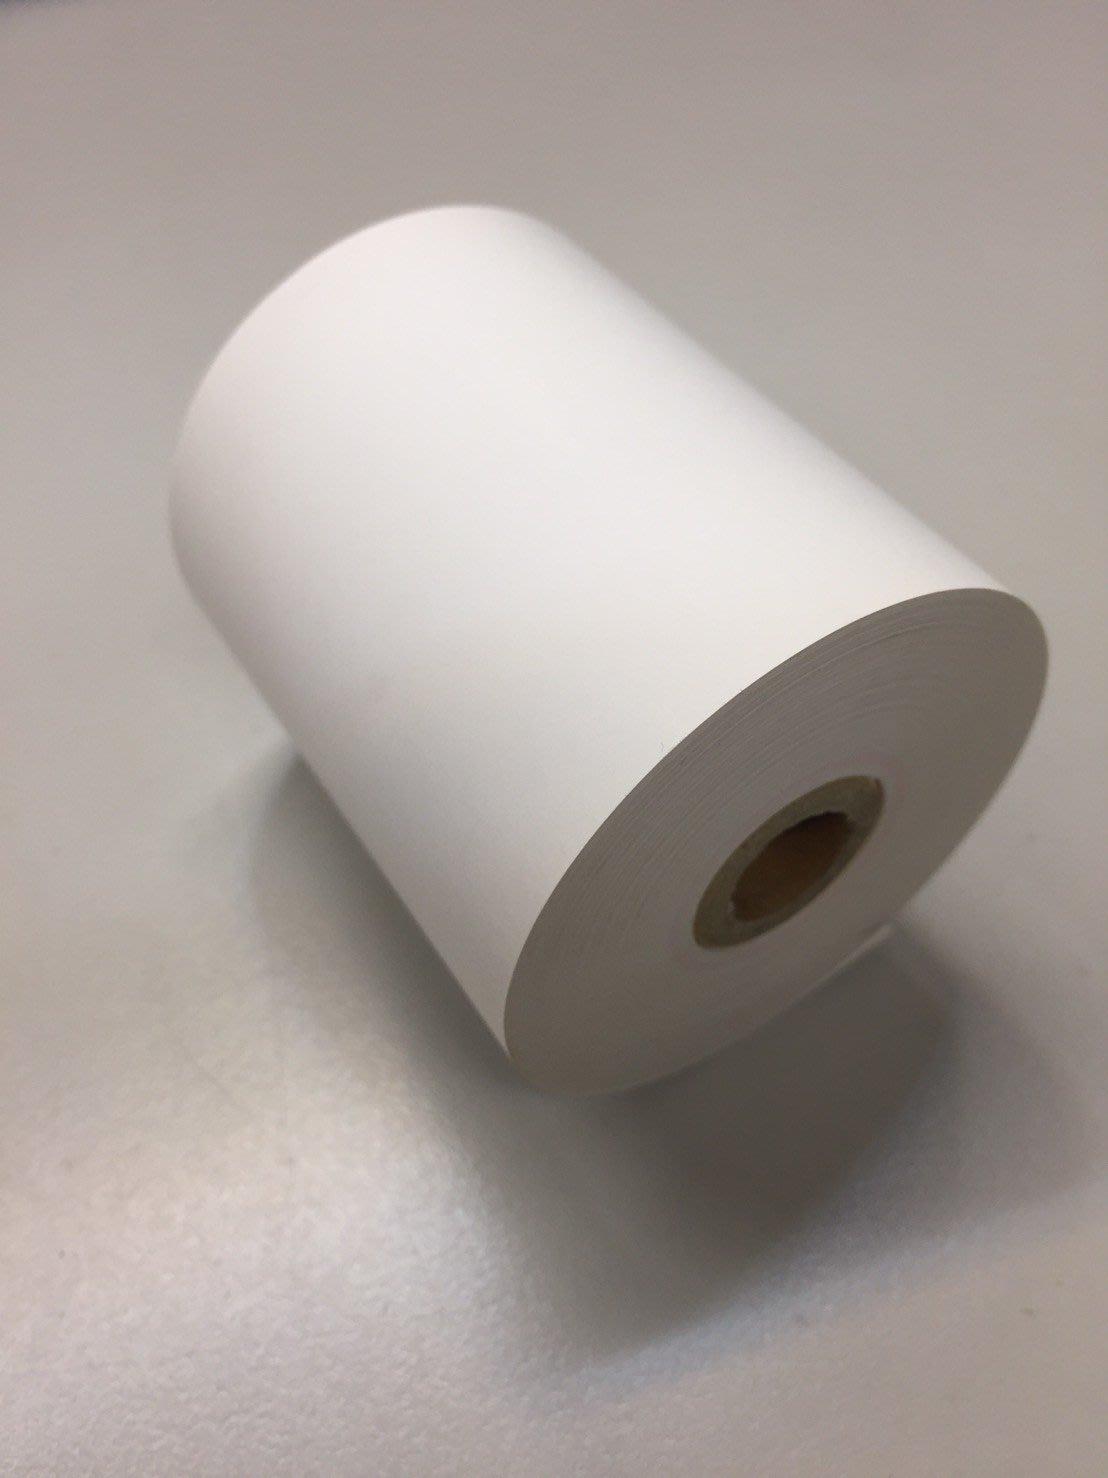 CASIO SE-G1專用紙 熱感紙 卡西歐 收銀機熱感紙 SEG1